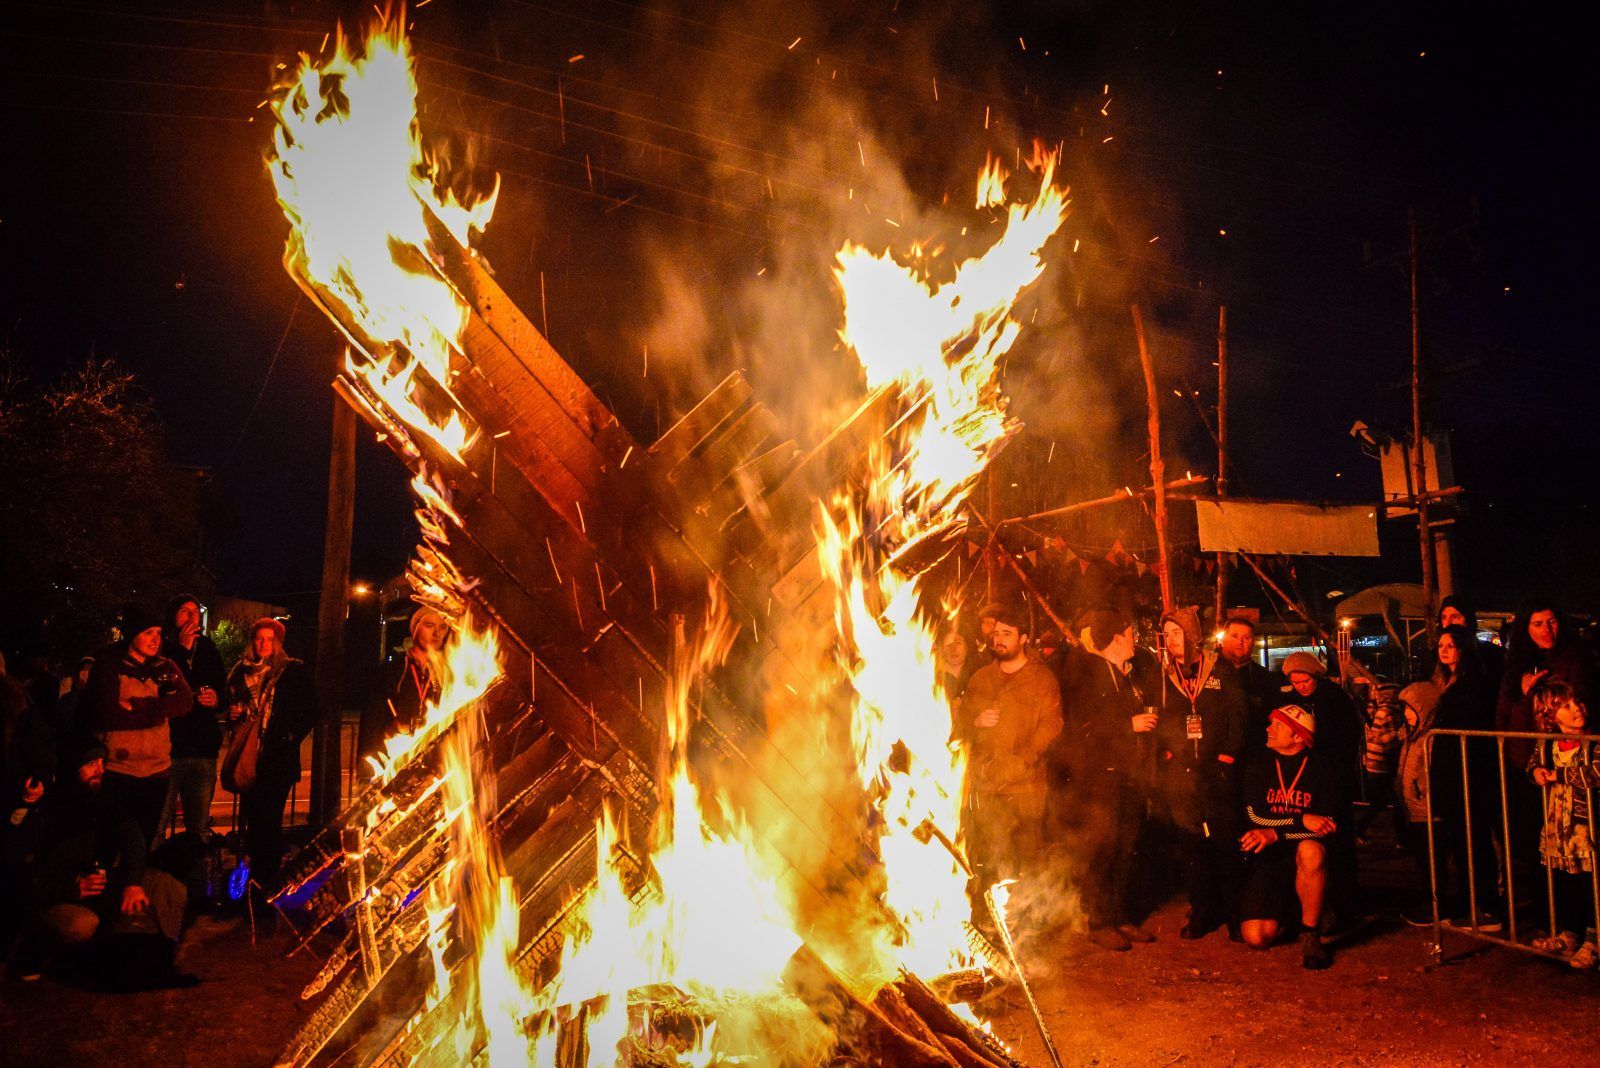 People gathered around a bonfire